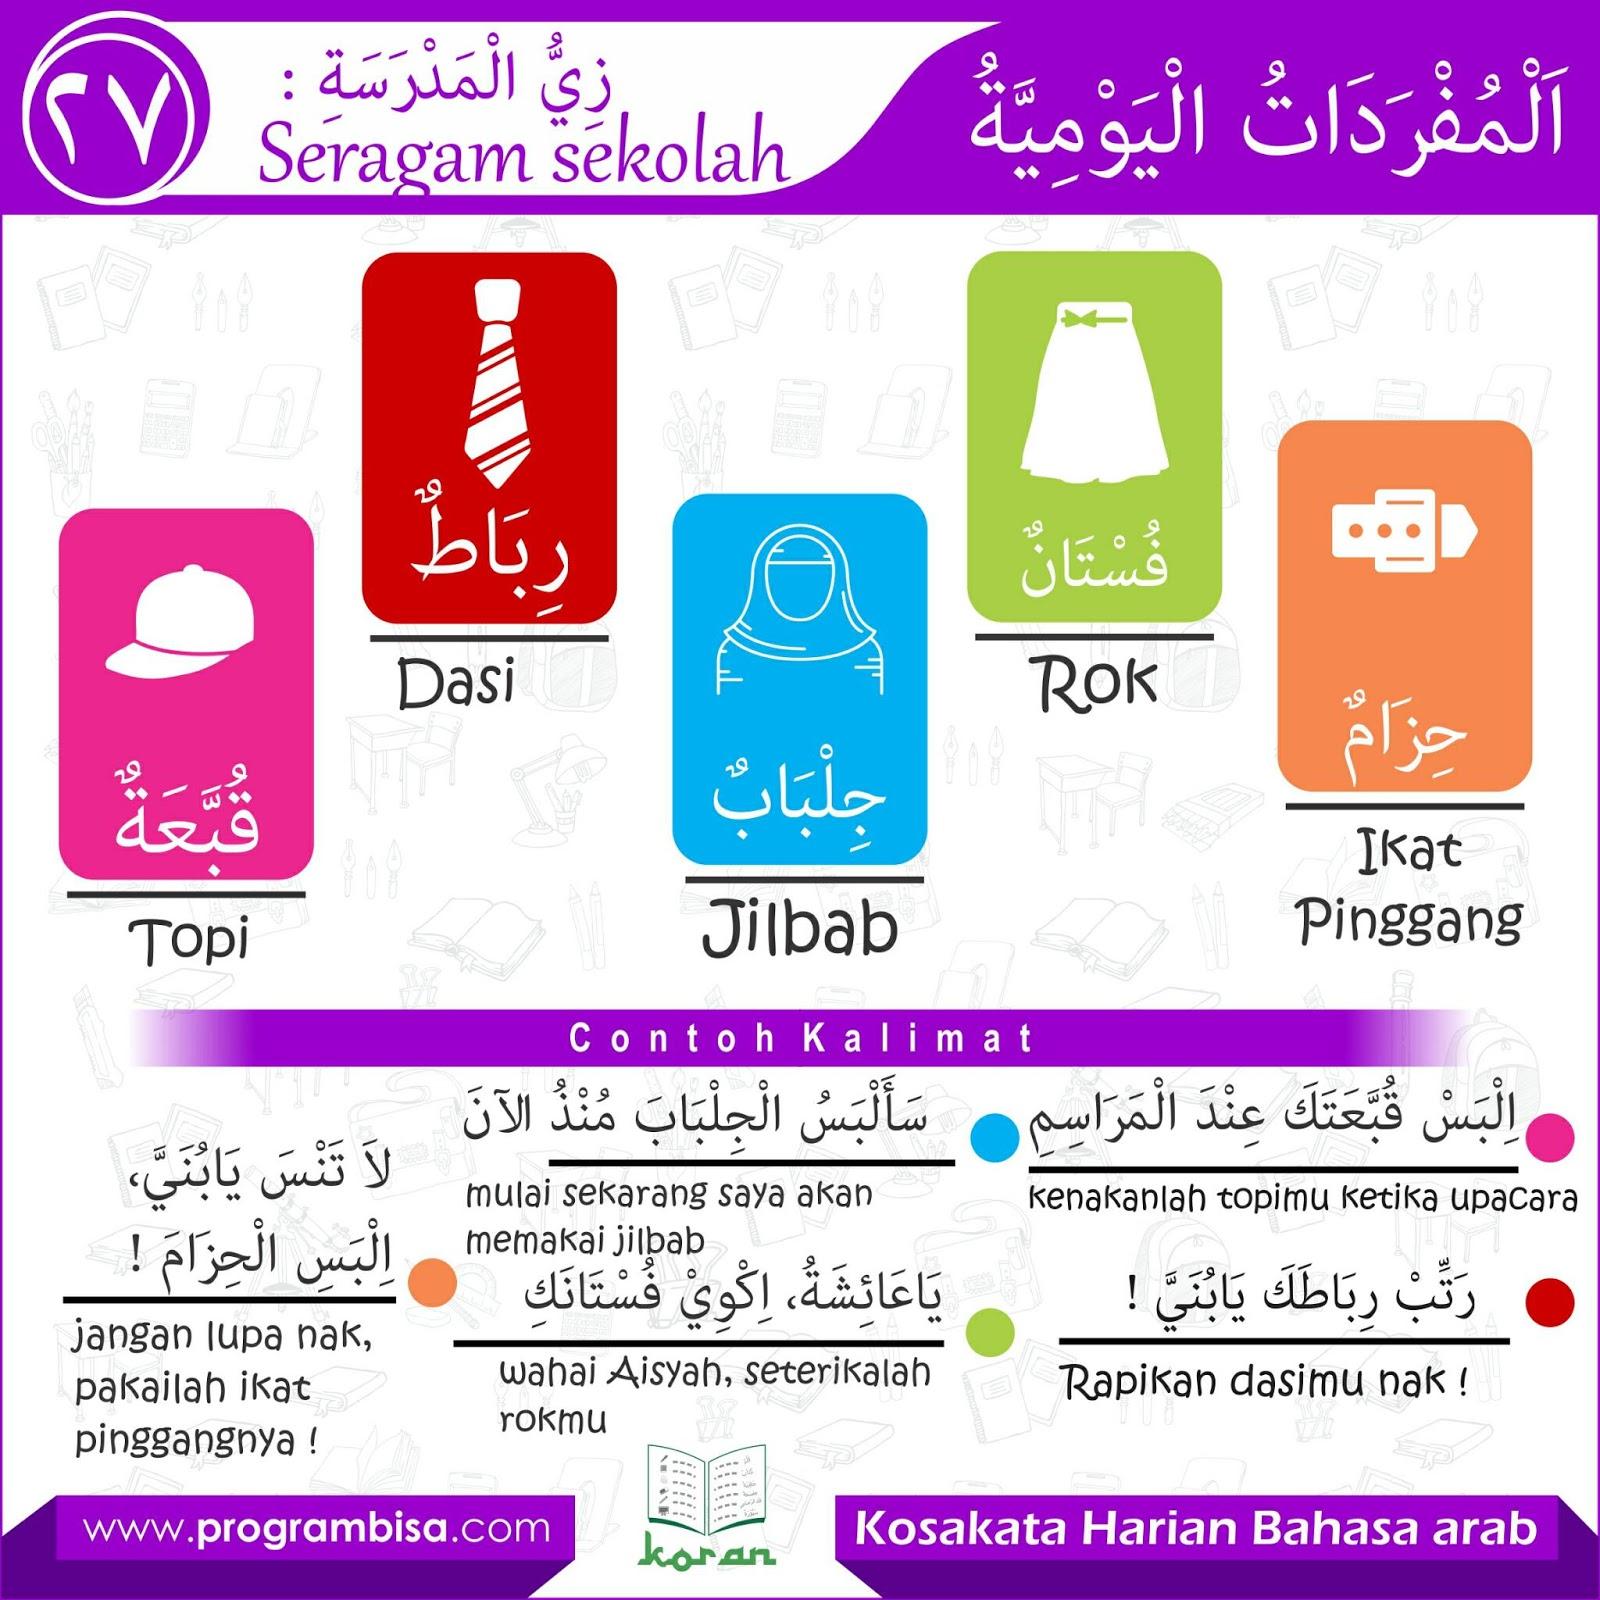 50 Kosakata Bahasa Arab Tentang Peralatan Sekolah Dan Kelas Ilmu